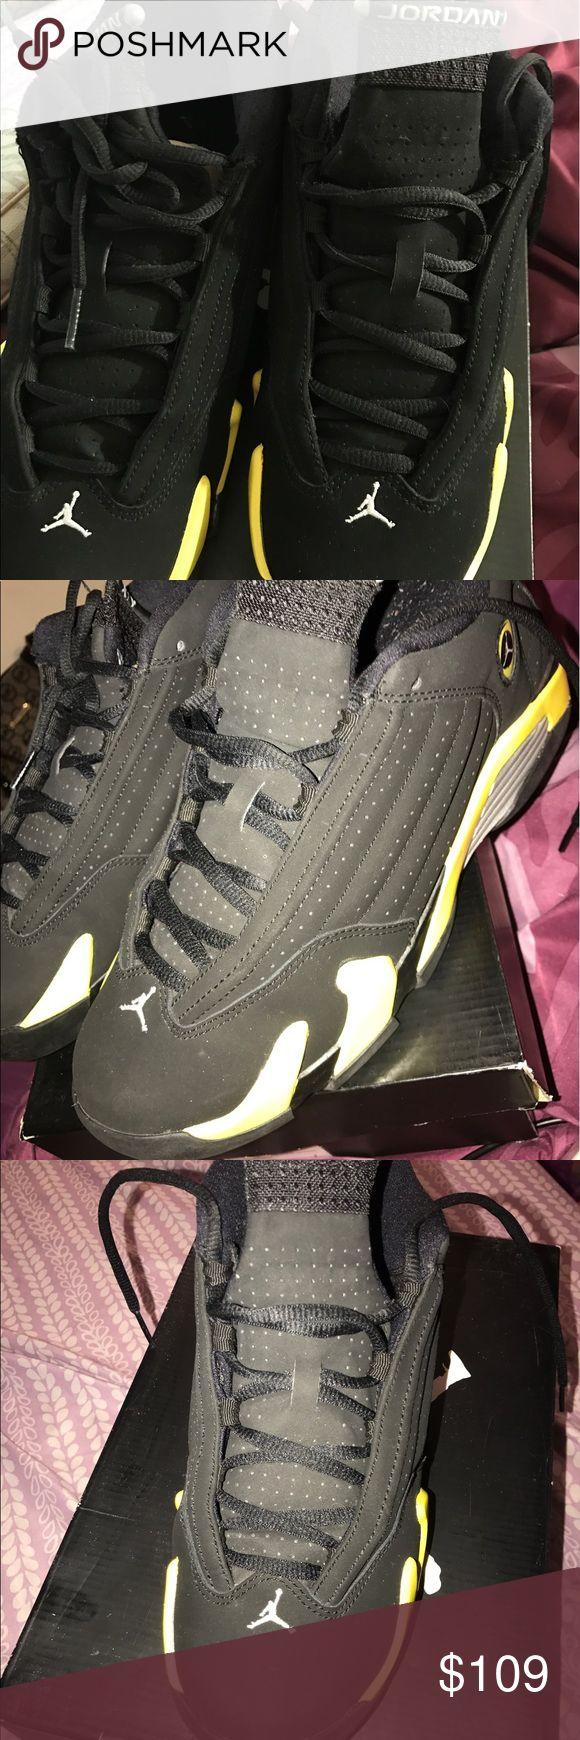 "Jordan Retro 14 ""Thunder"" black and yellow, comfortable, size 7 Jordan Shoes Athletic Shoes"